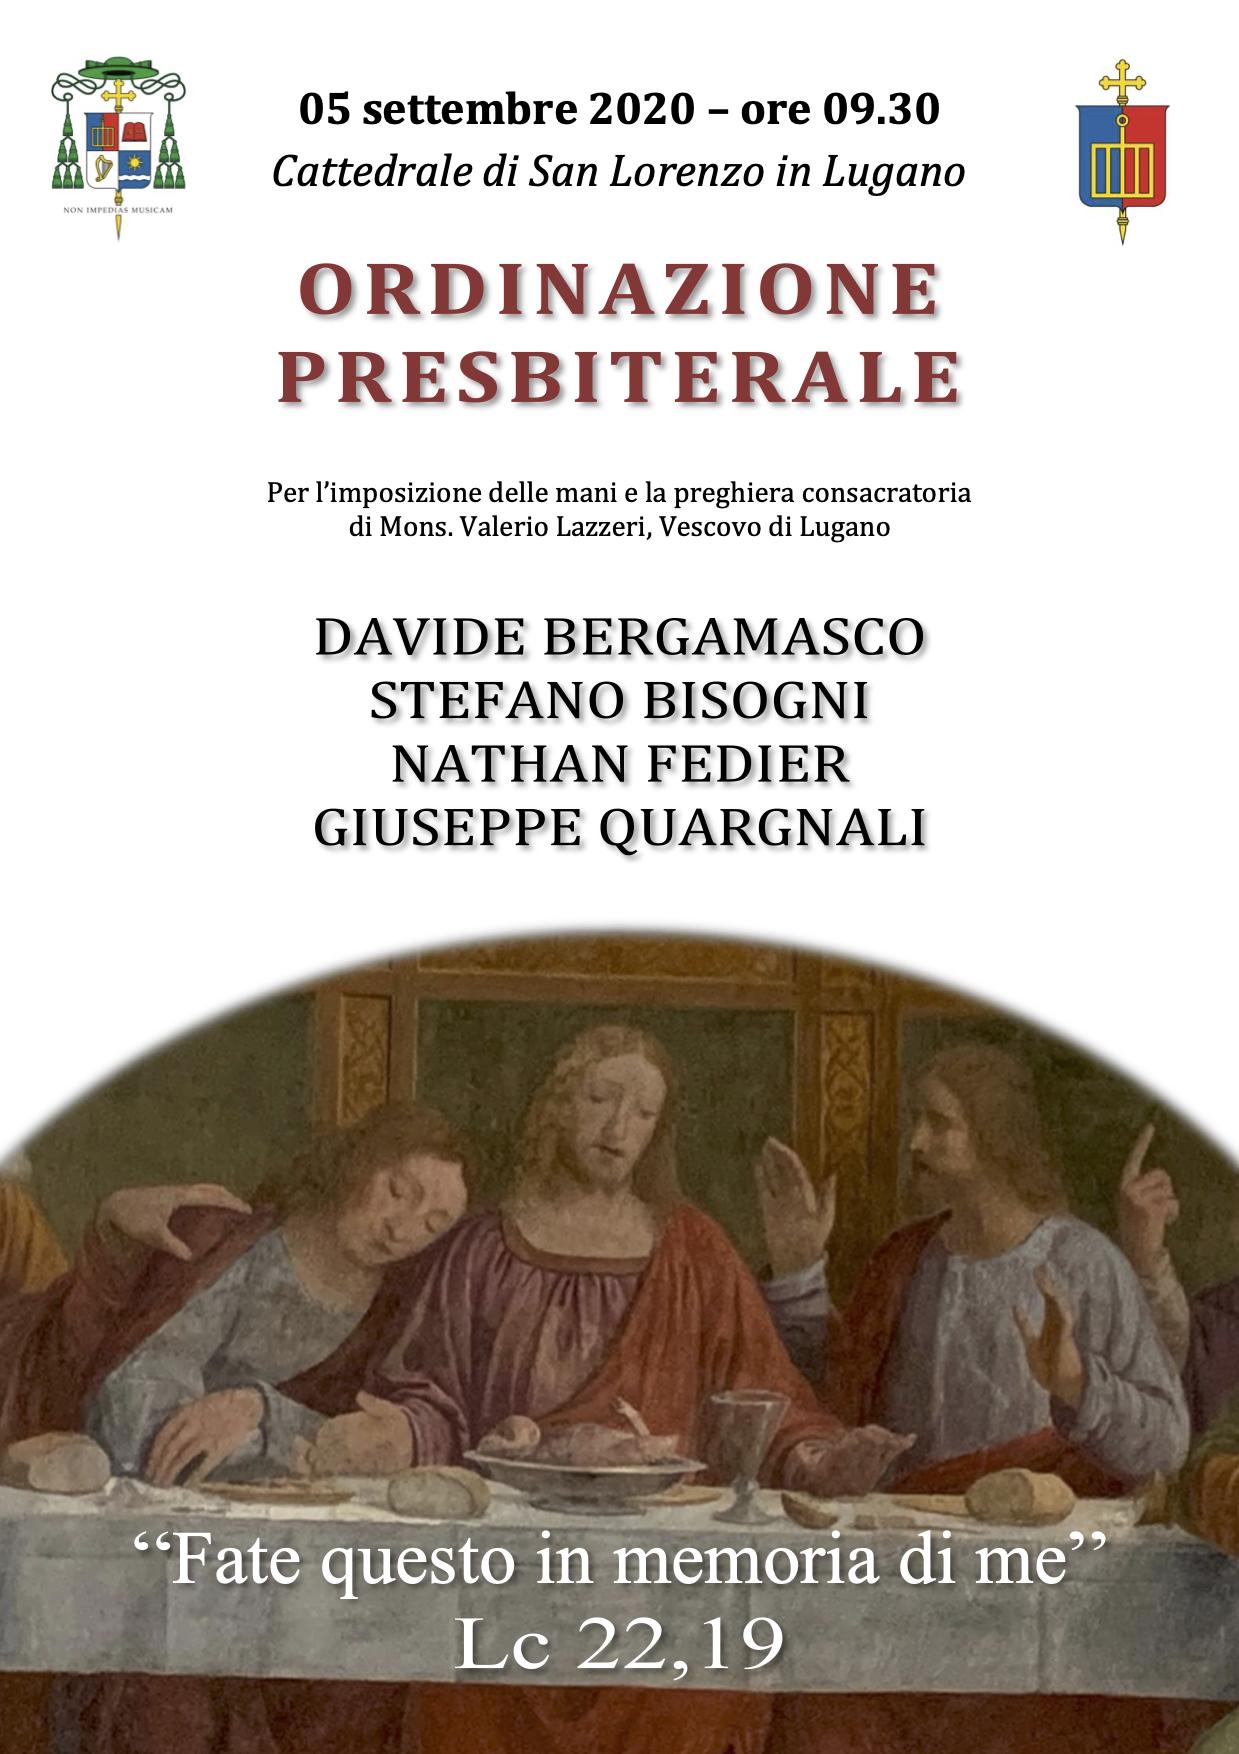 Manifesto Ordinazioni Presbiterali 2020